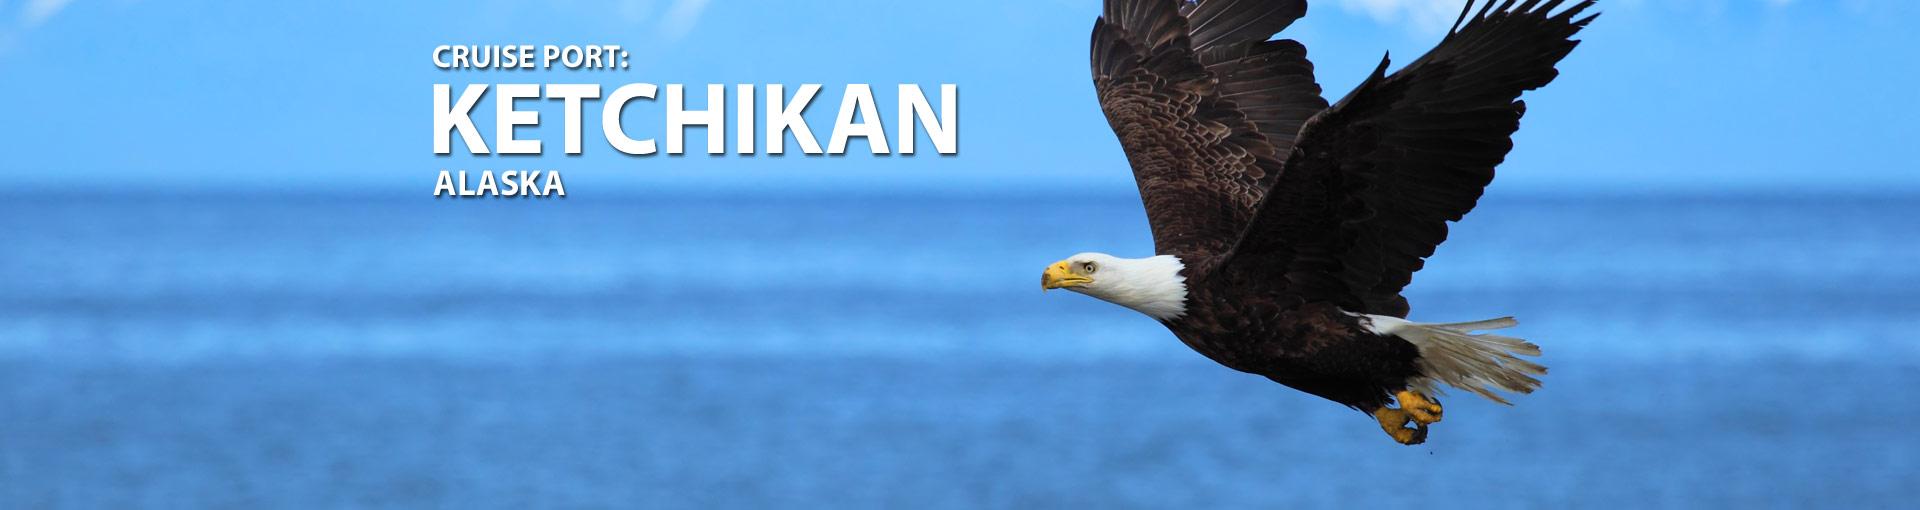 Cruise Port: Ketchikan, Alaska